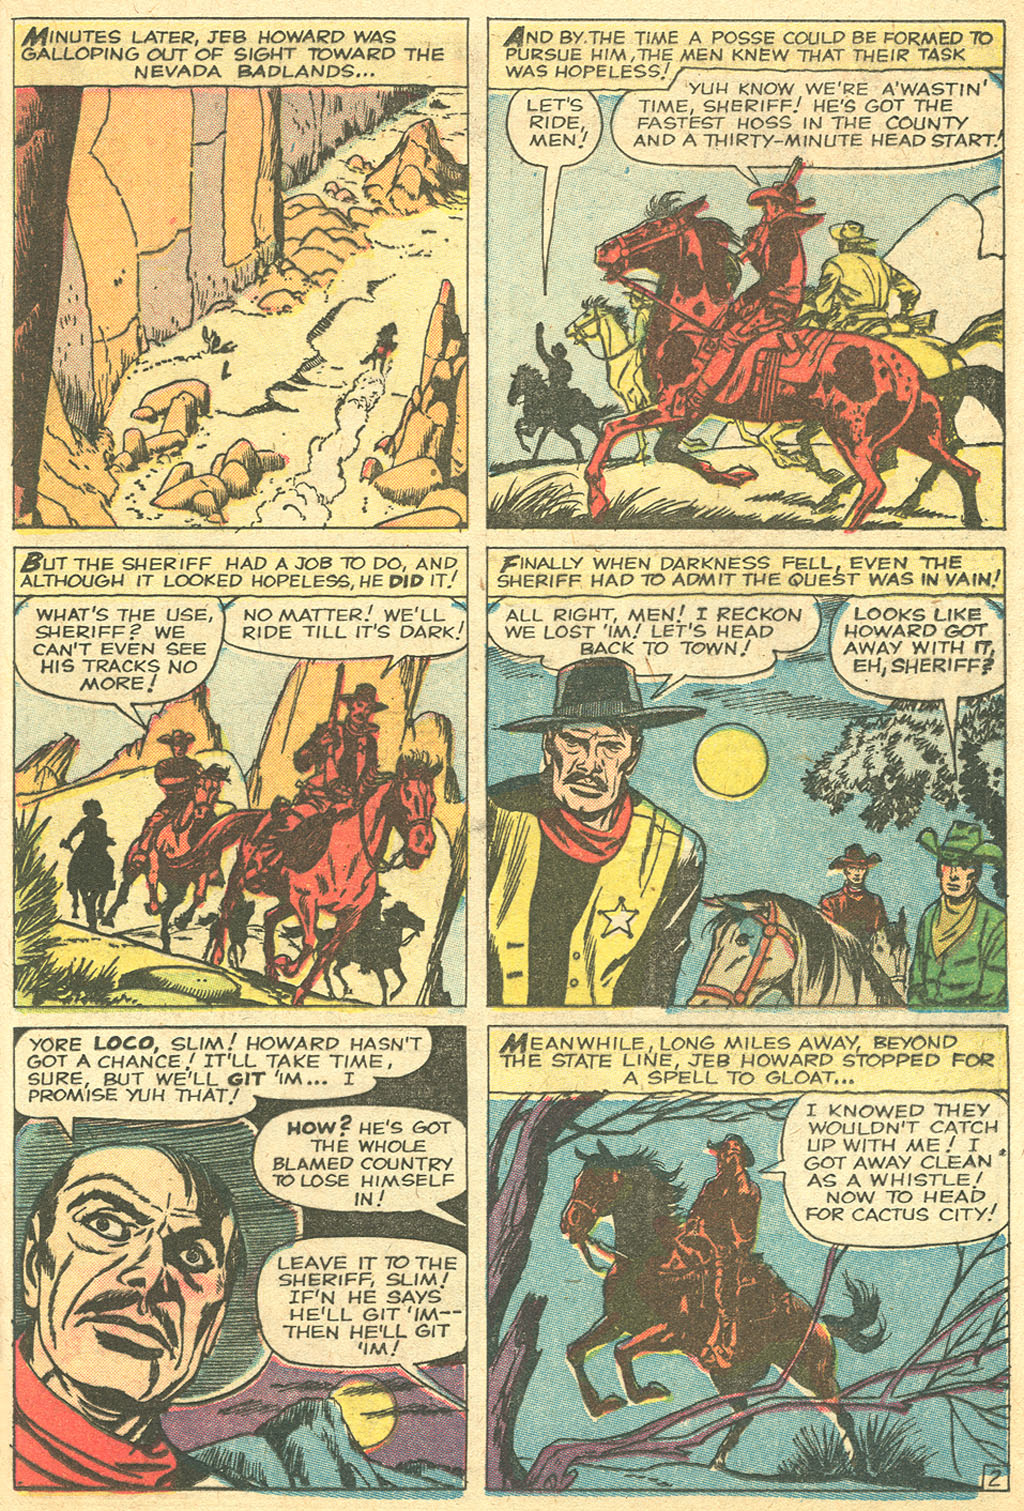 Read online Two-Gun Kid comic -  Issue #55 - 21